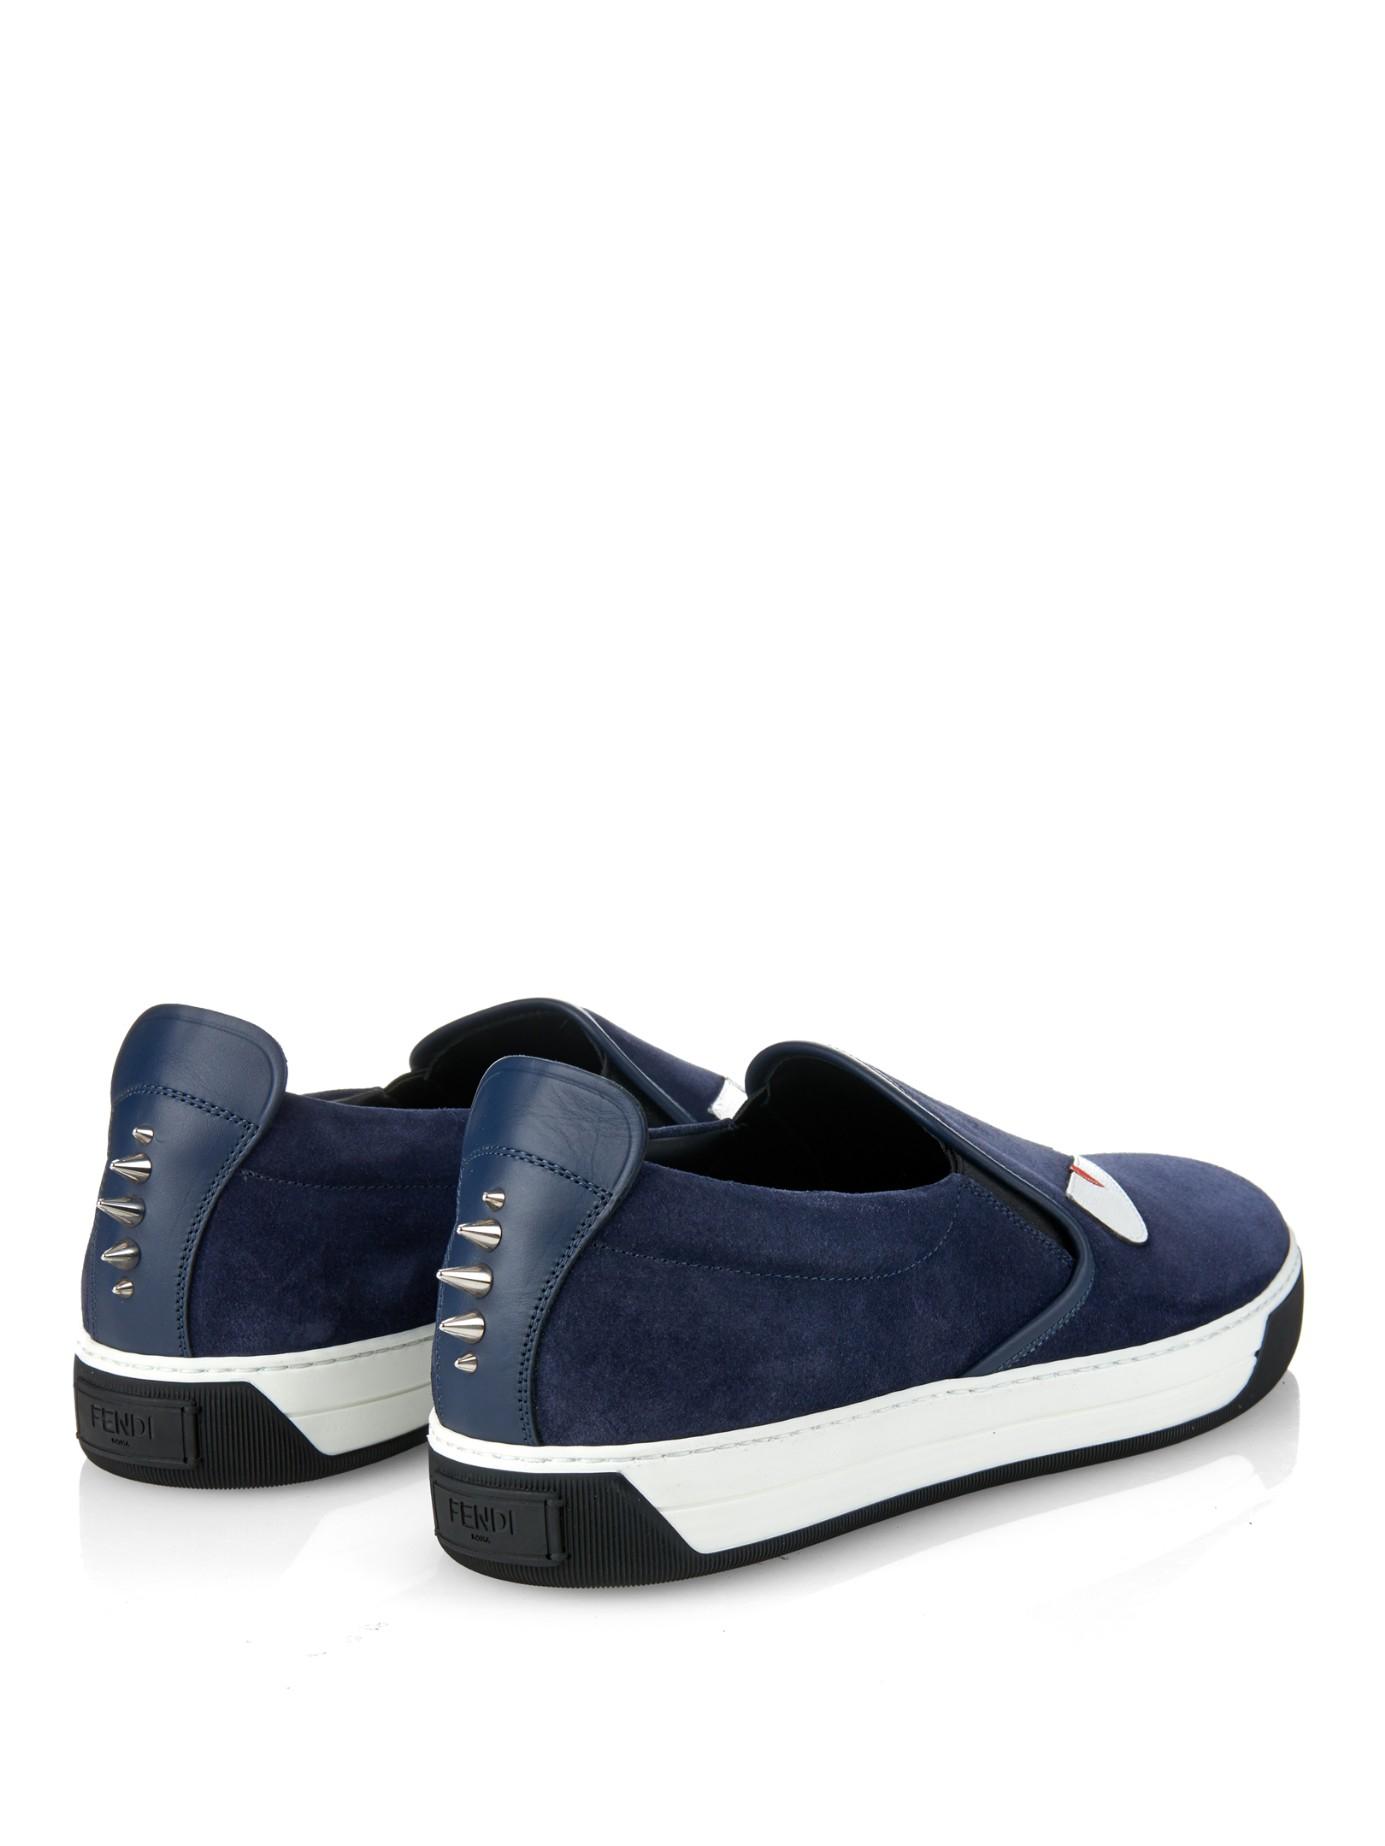 Bugs Sac Fendi Glisser Sur Chaussures De Sport - Bleu eHHiyaC